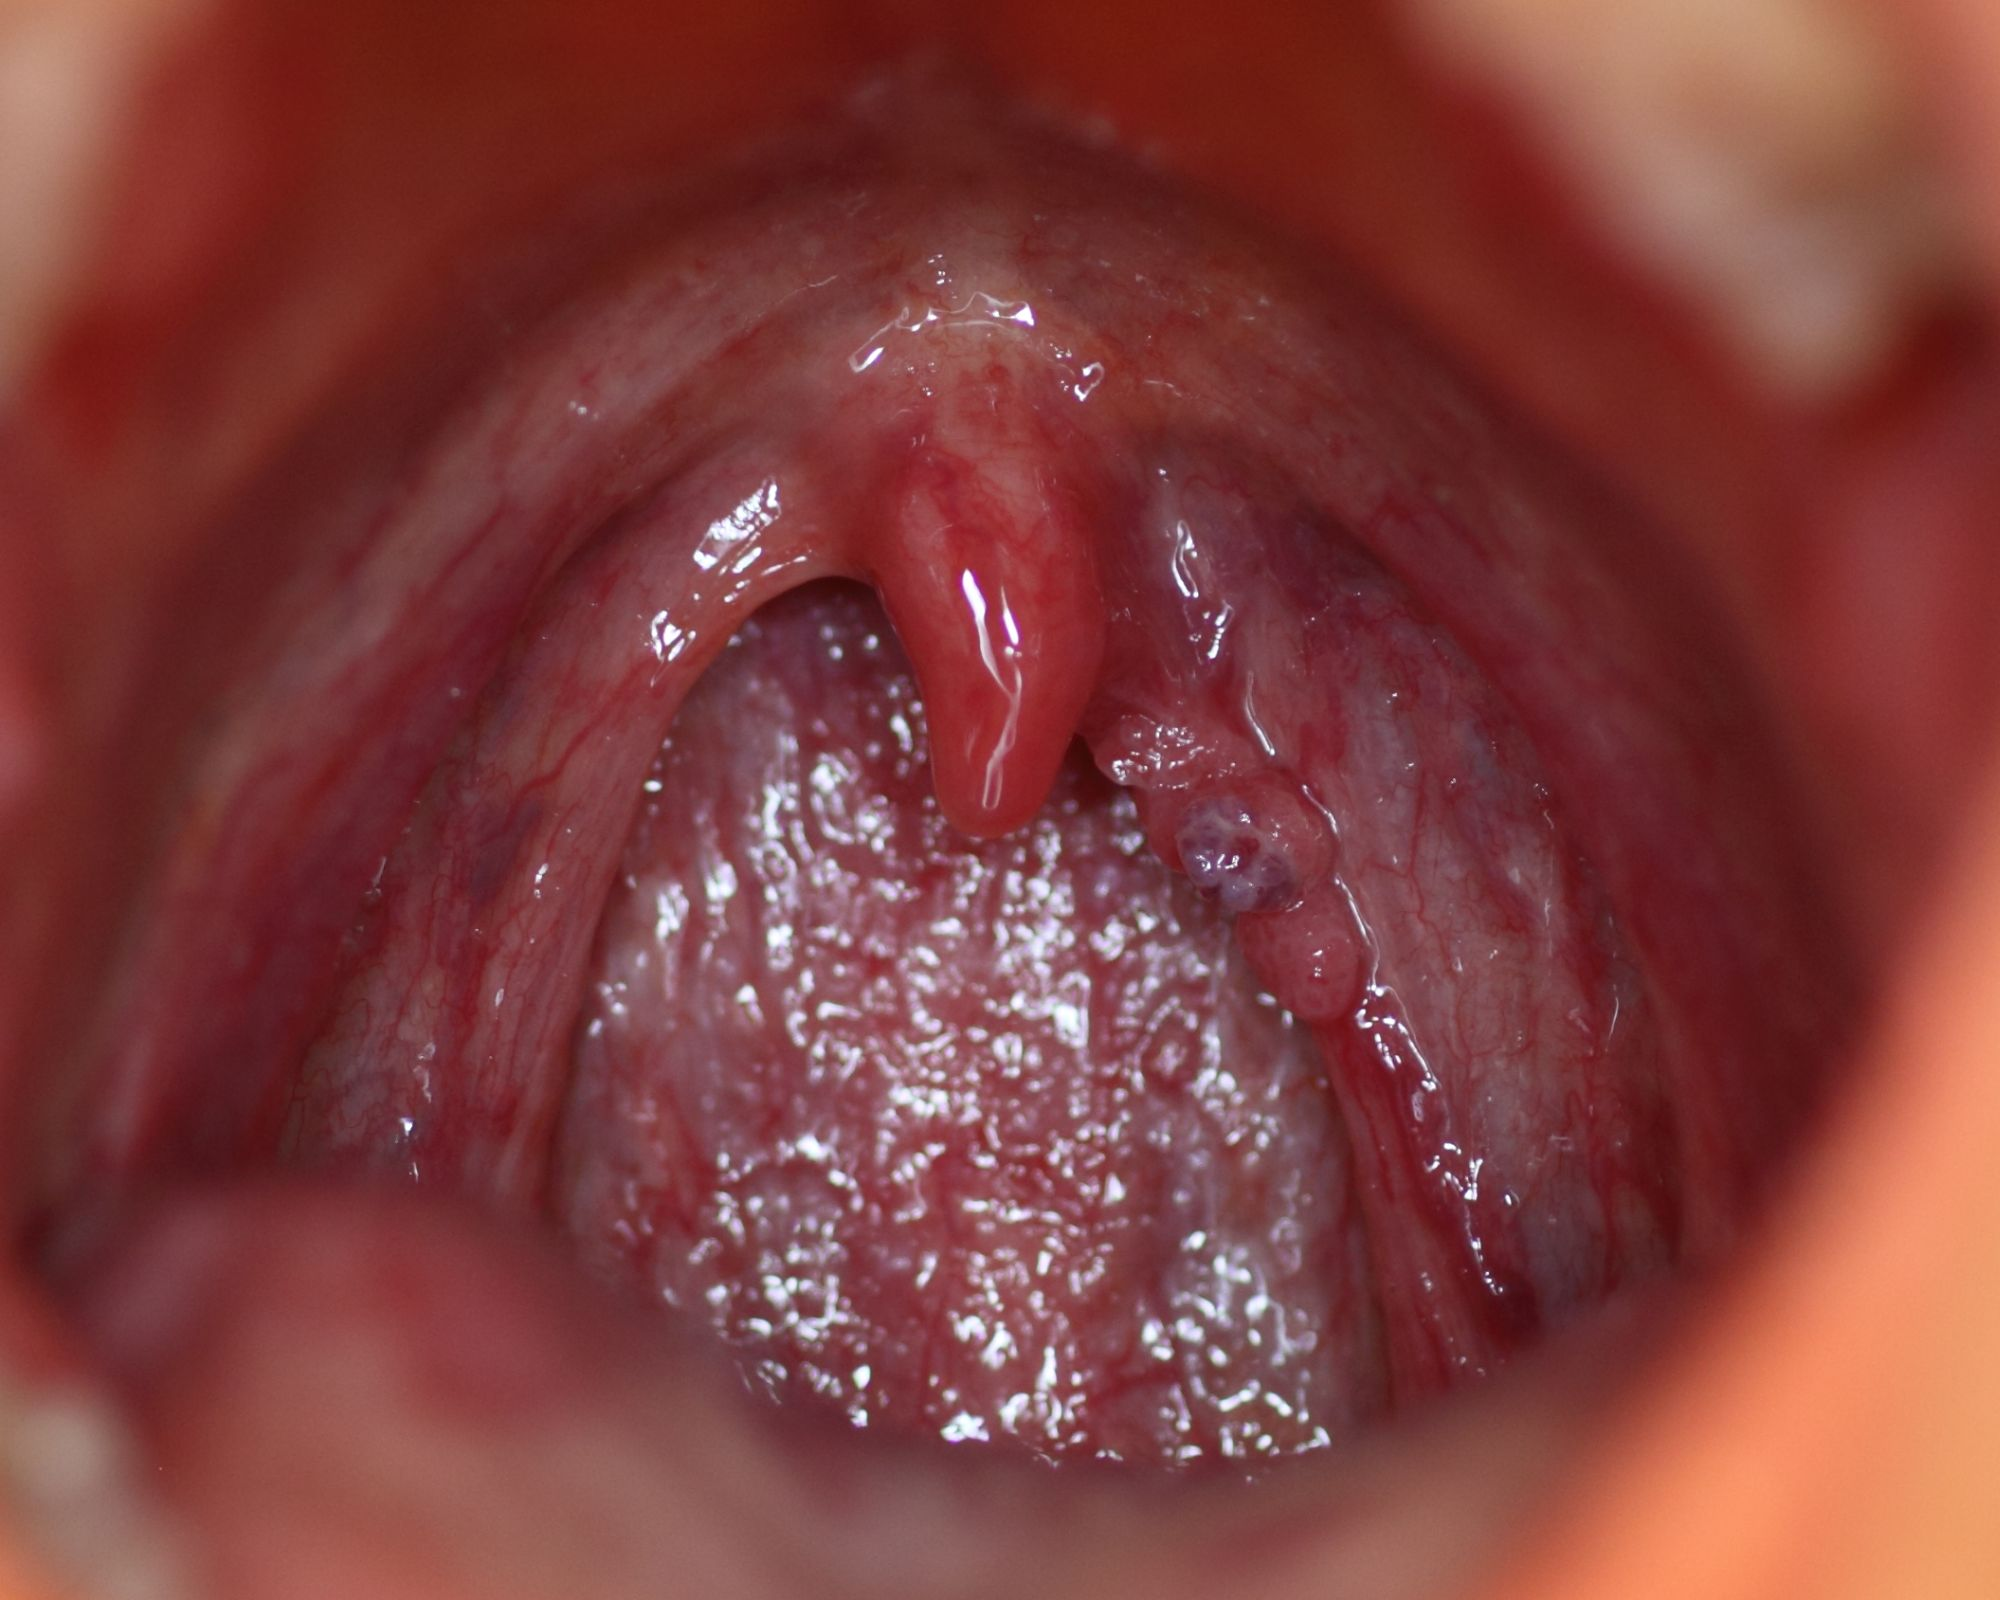 hpv in uvula